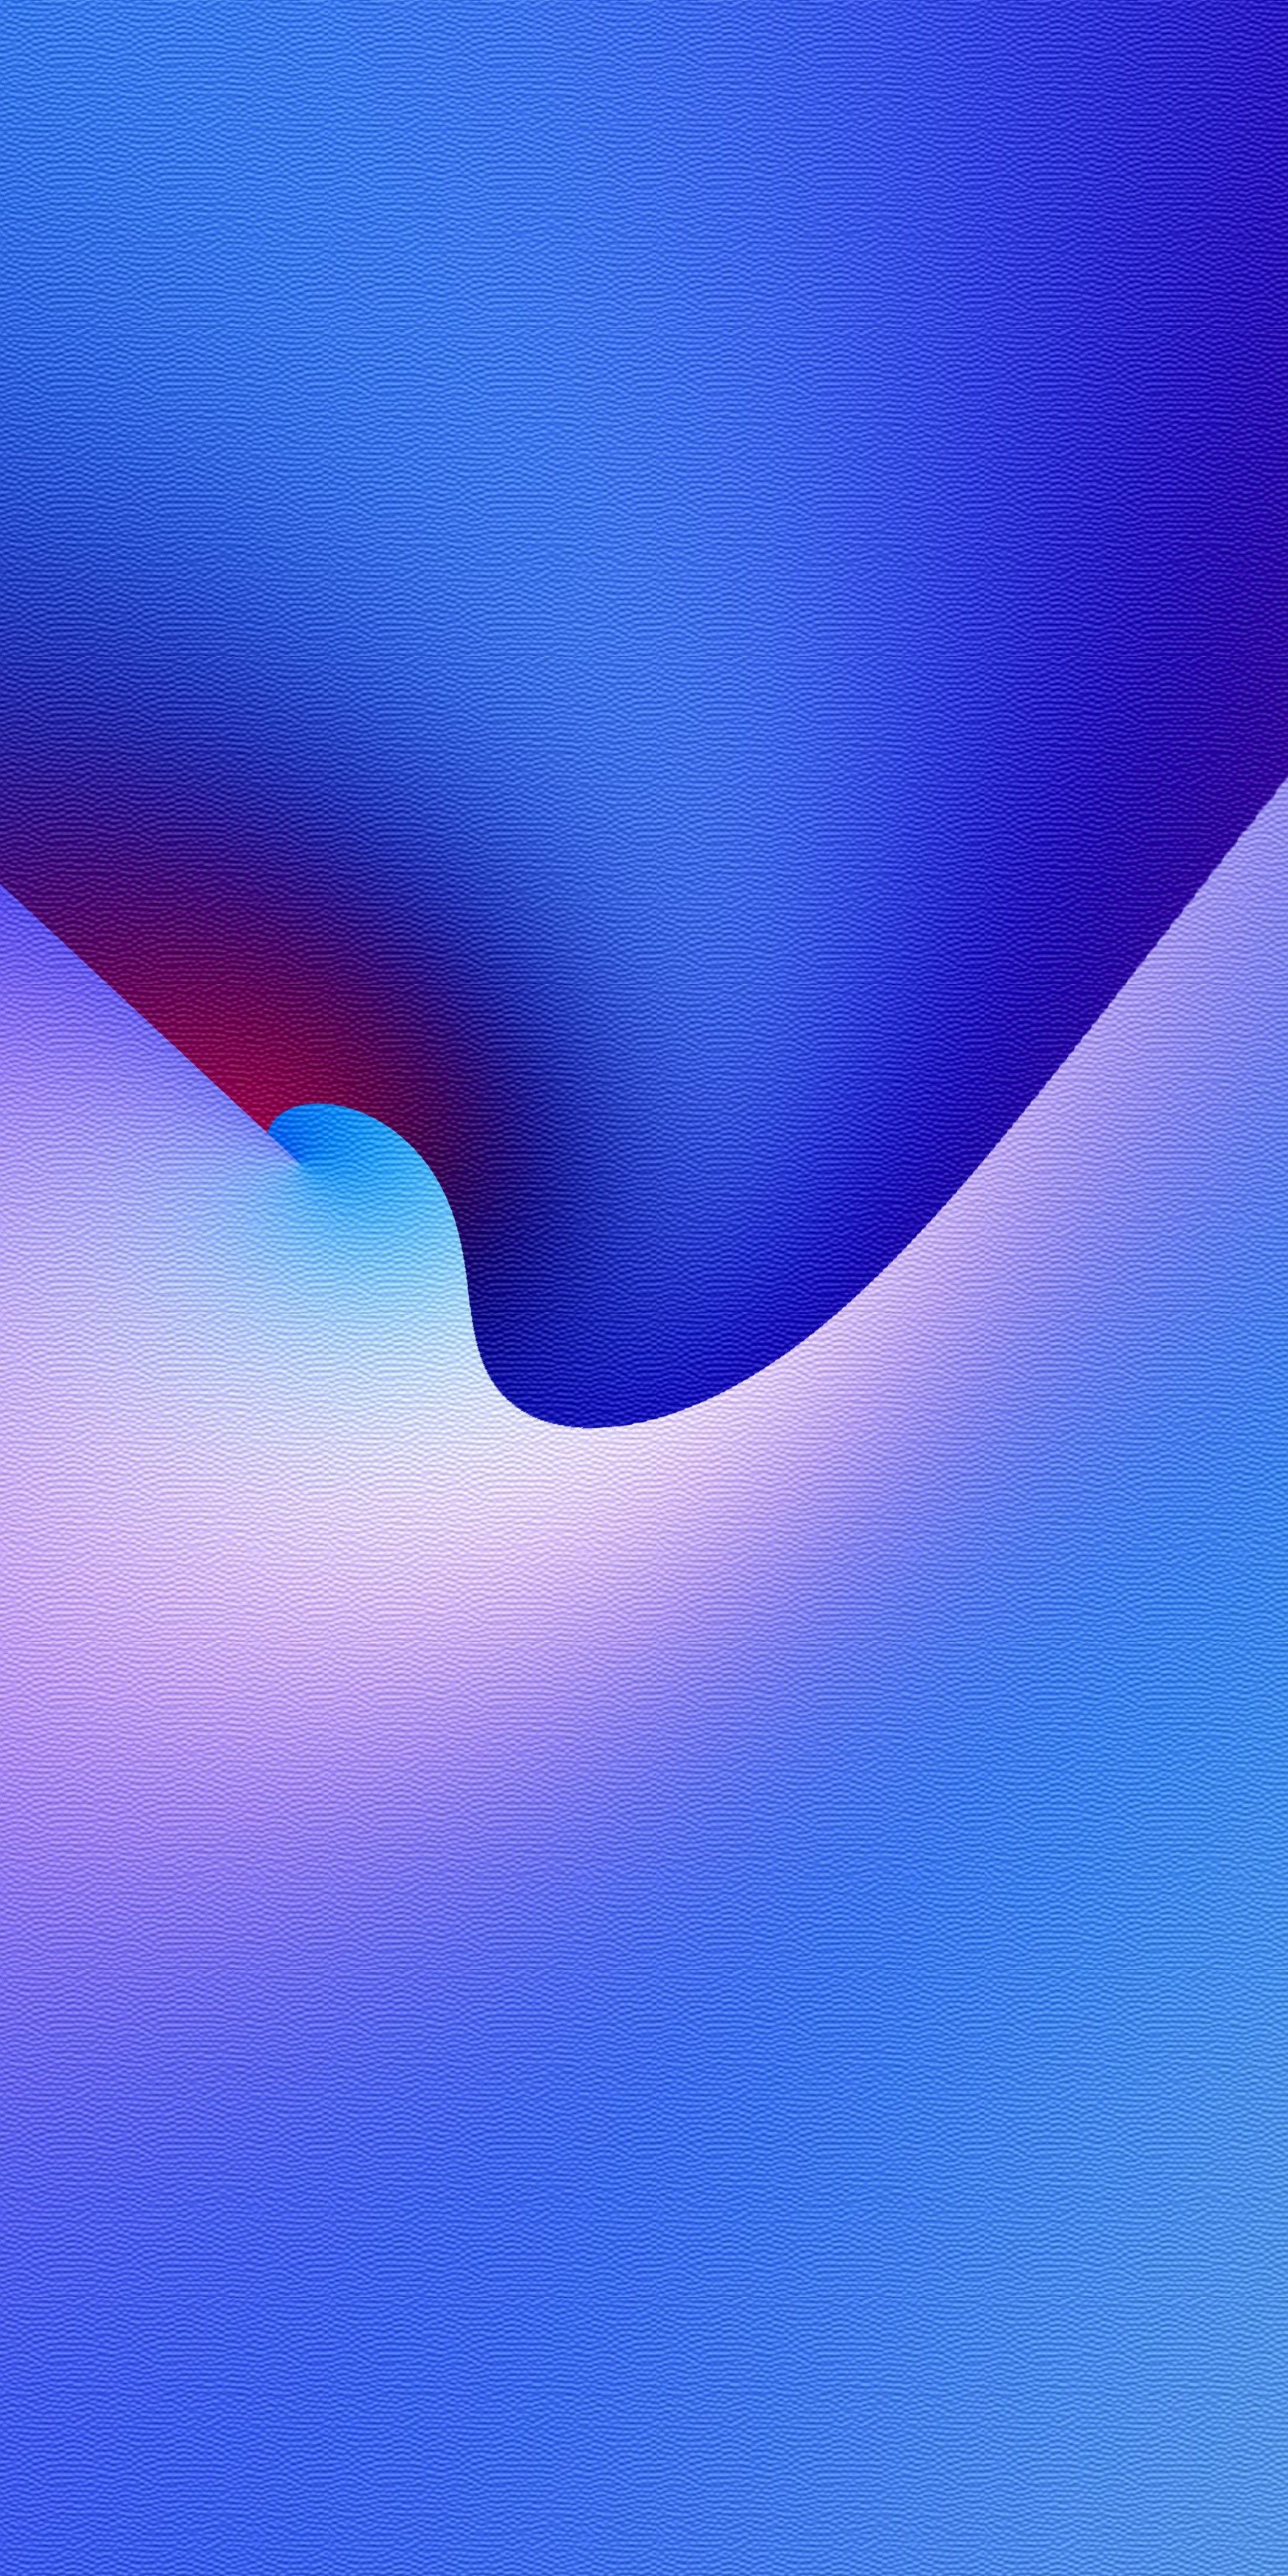 Iphone 11 Pro Wallpaper In 2020 Iphone Wallpaper Ios Original Iphone Wallpaper Space Iphone Wallpaper